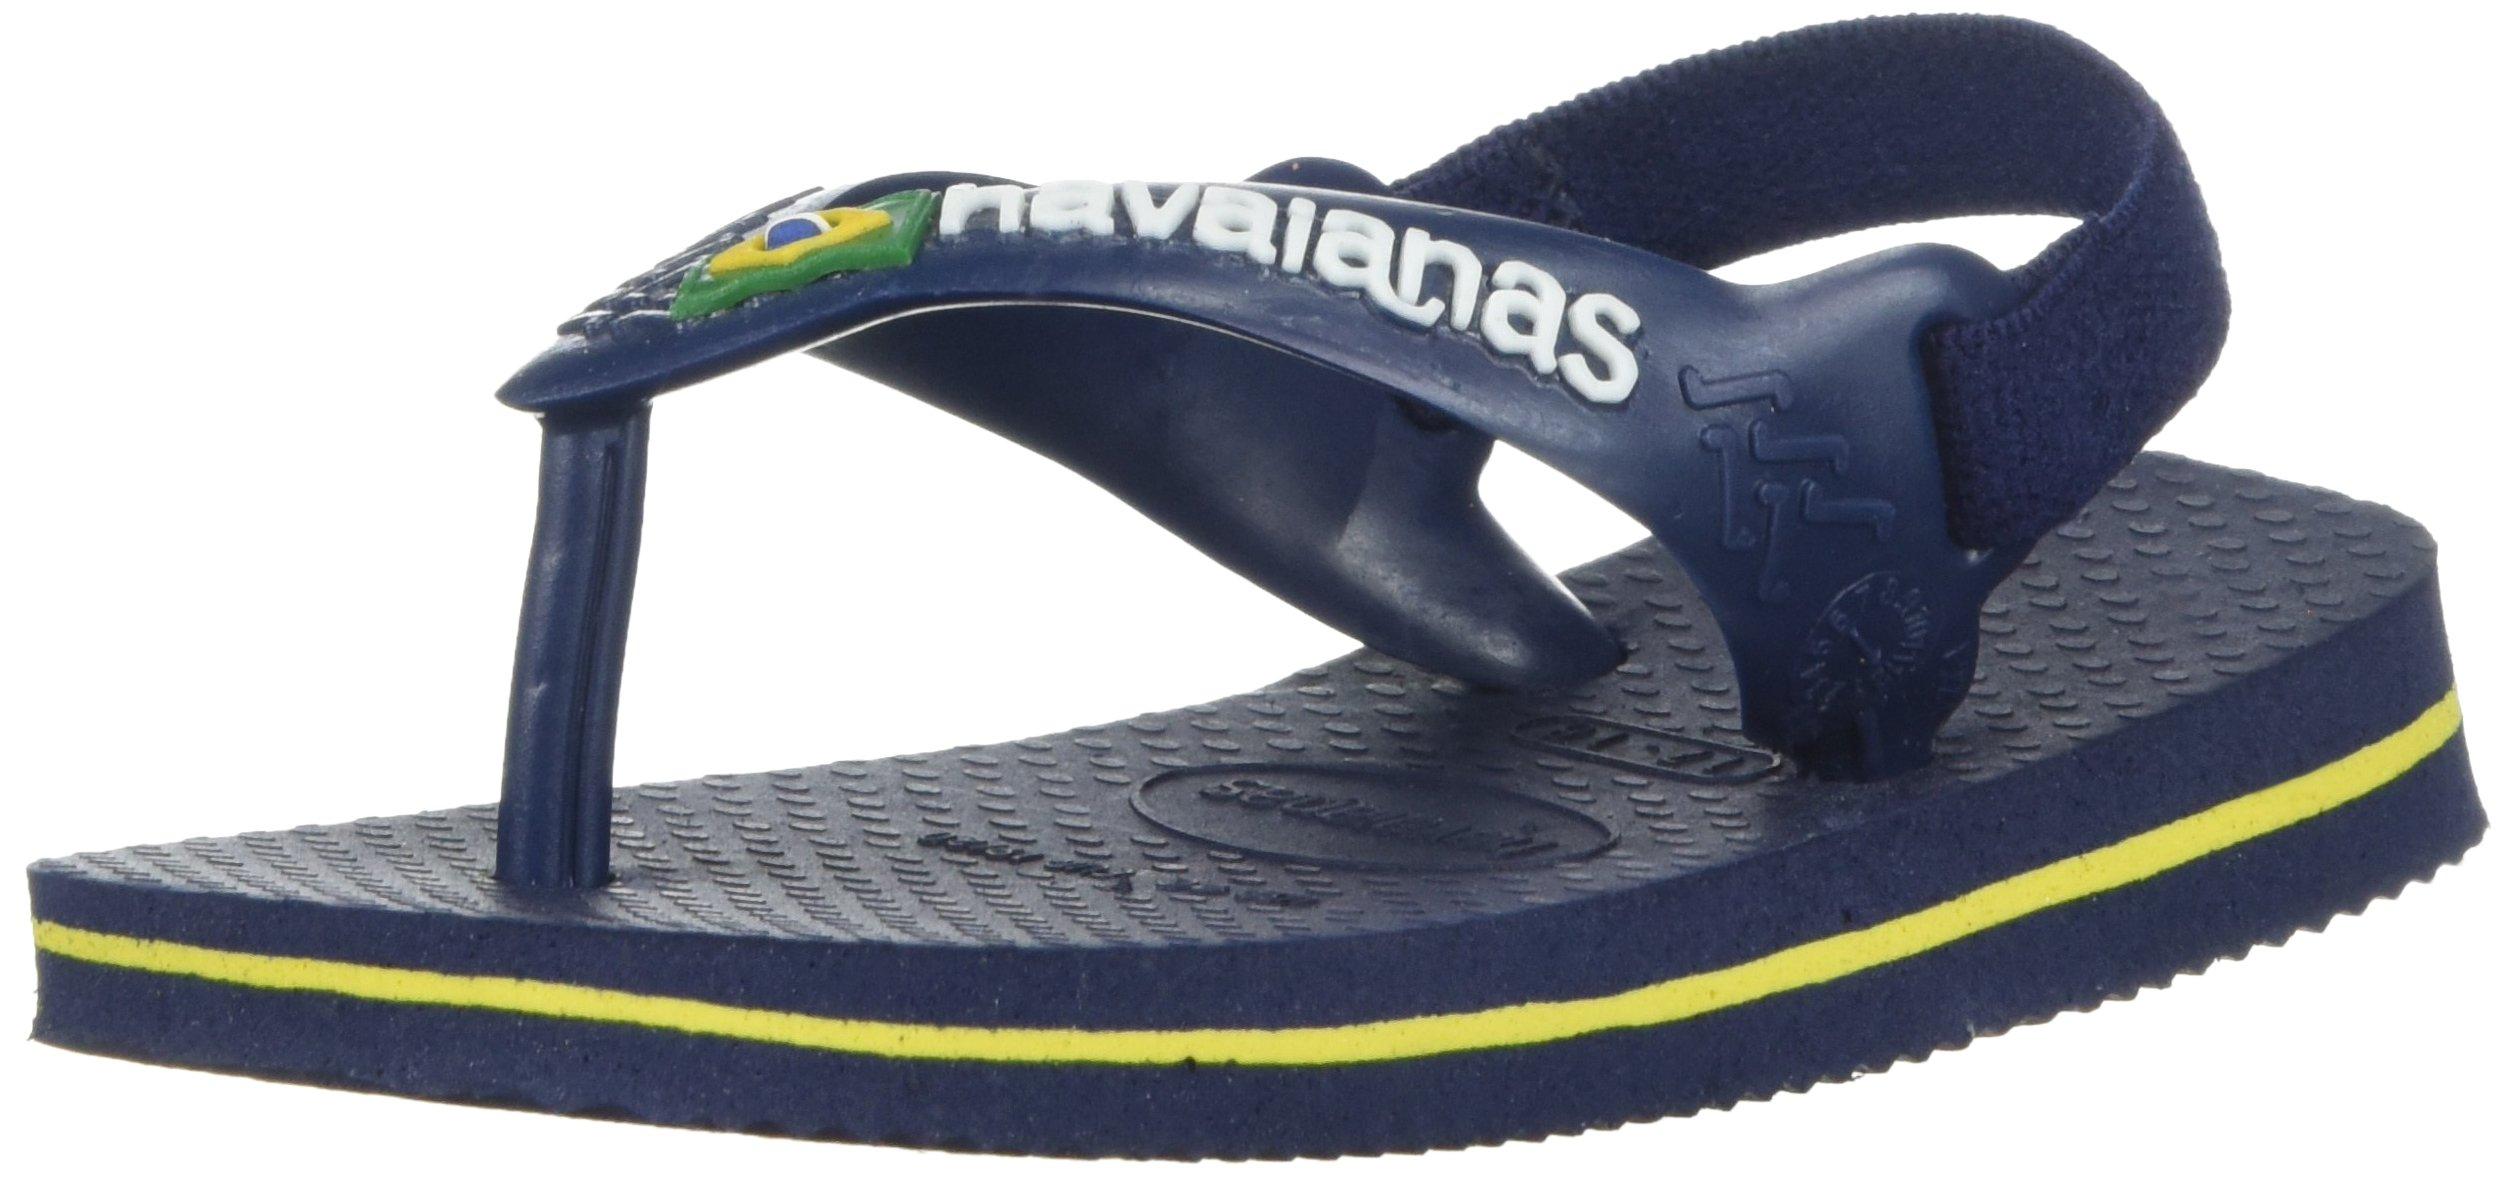 Havaianas Kids' Flip Flop Sandal, Brazil Logo Coral,Navy Blue/Citrus Yellow,22 BR (8 M US Toddler)